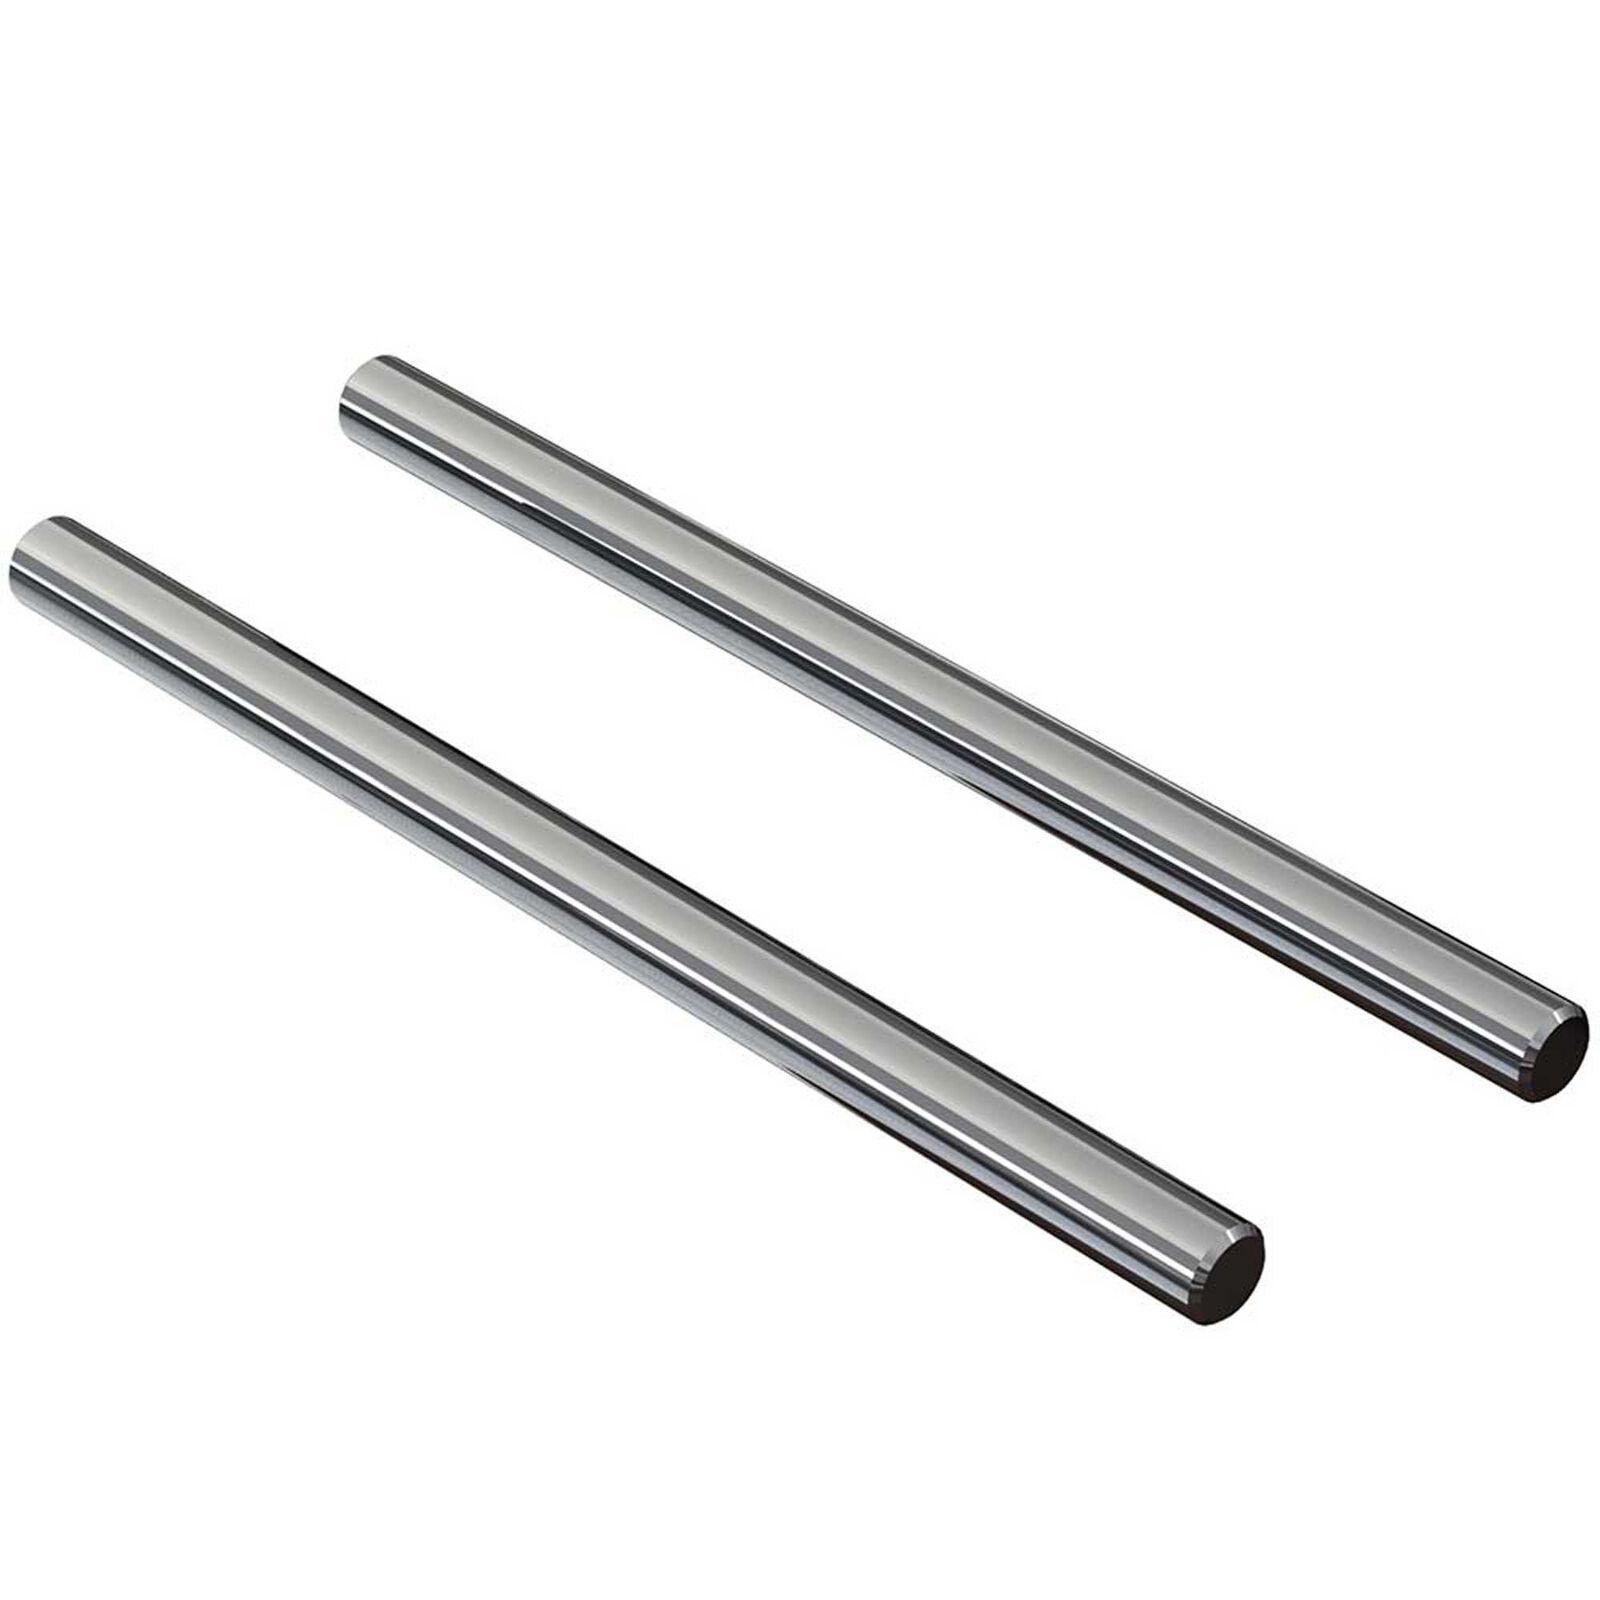 Hinge Pin 3x48.5mm 4x4 (2): Kraton Outcast